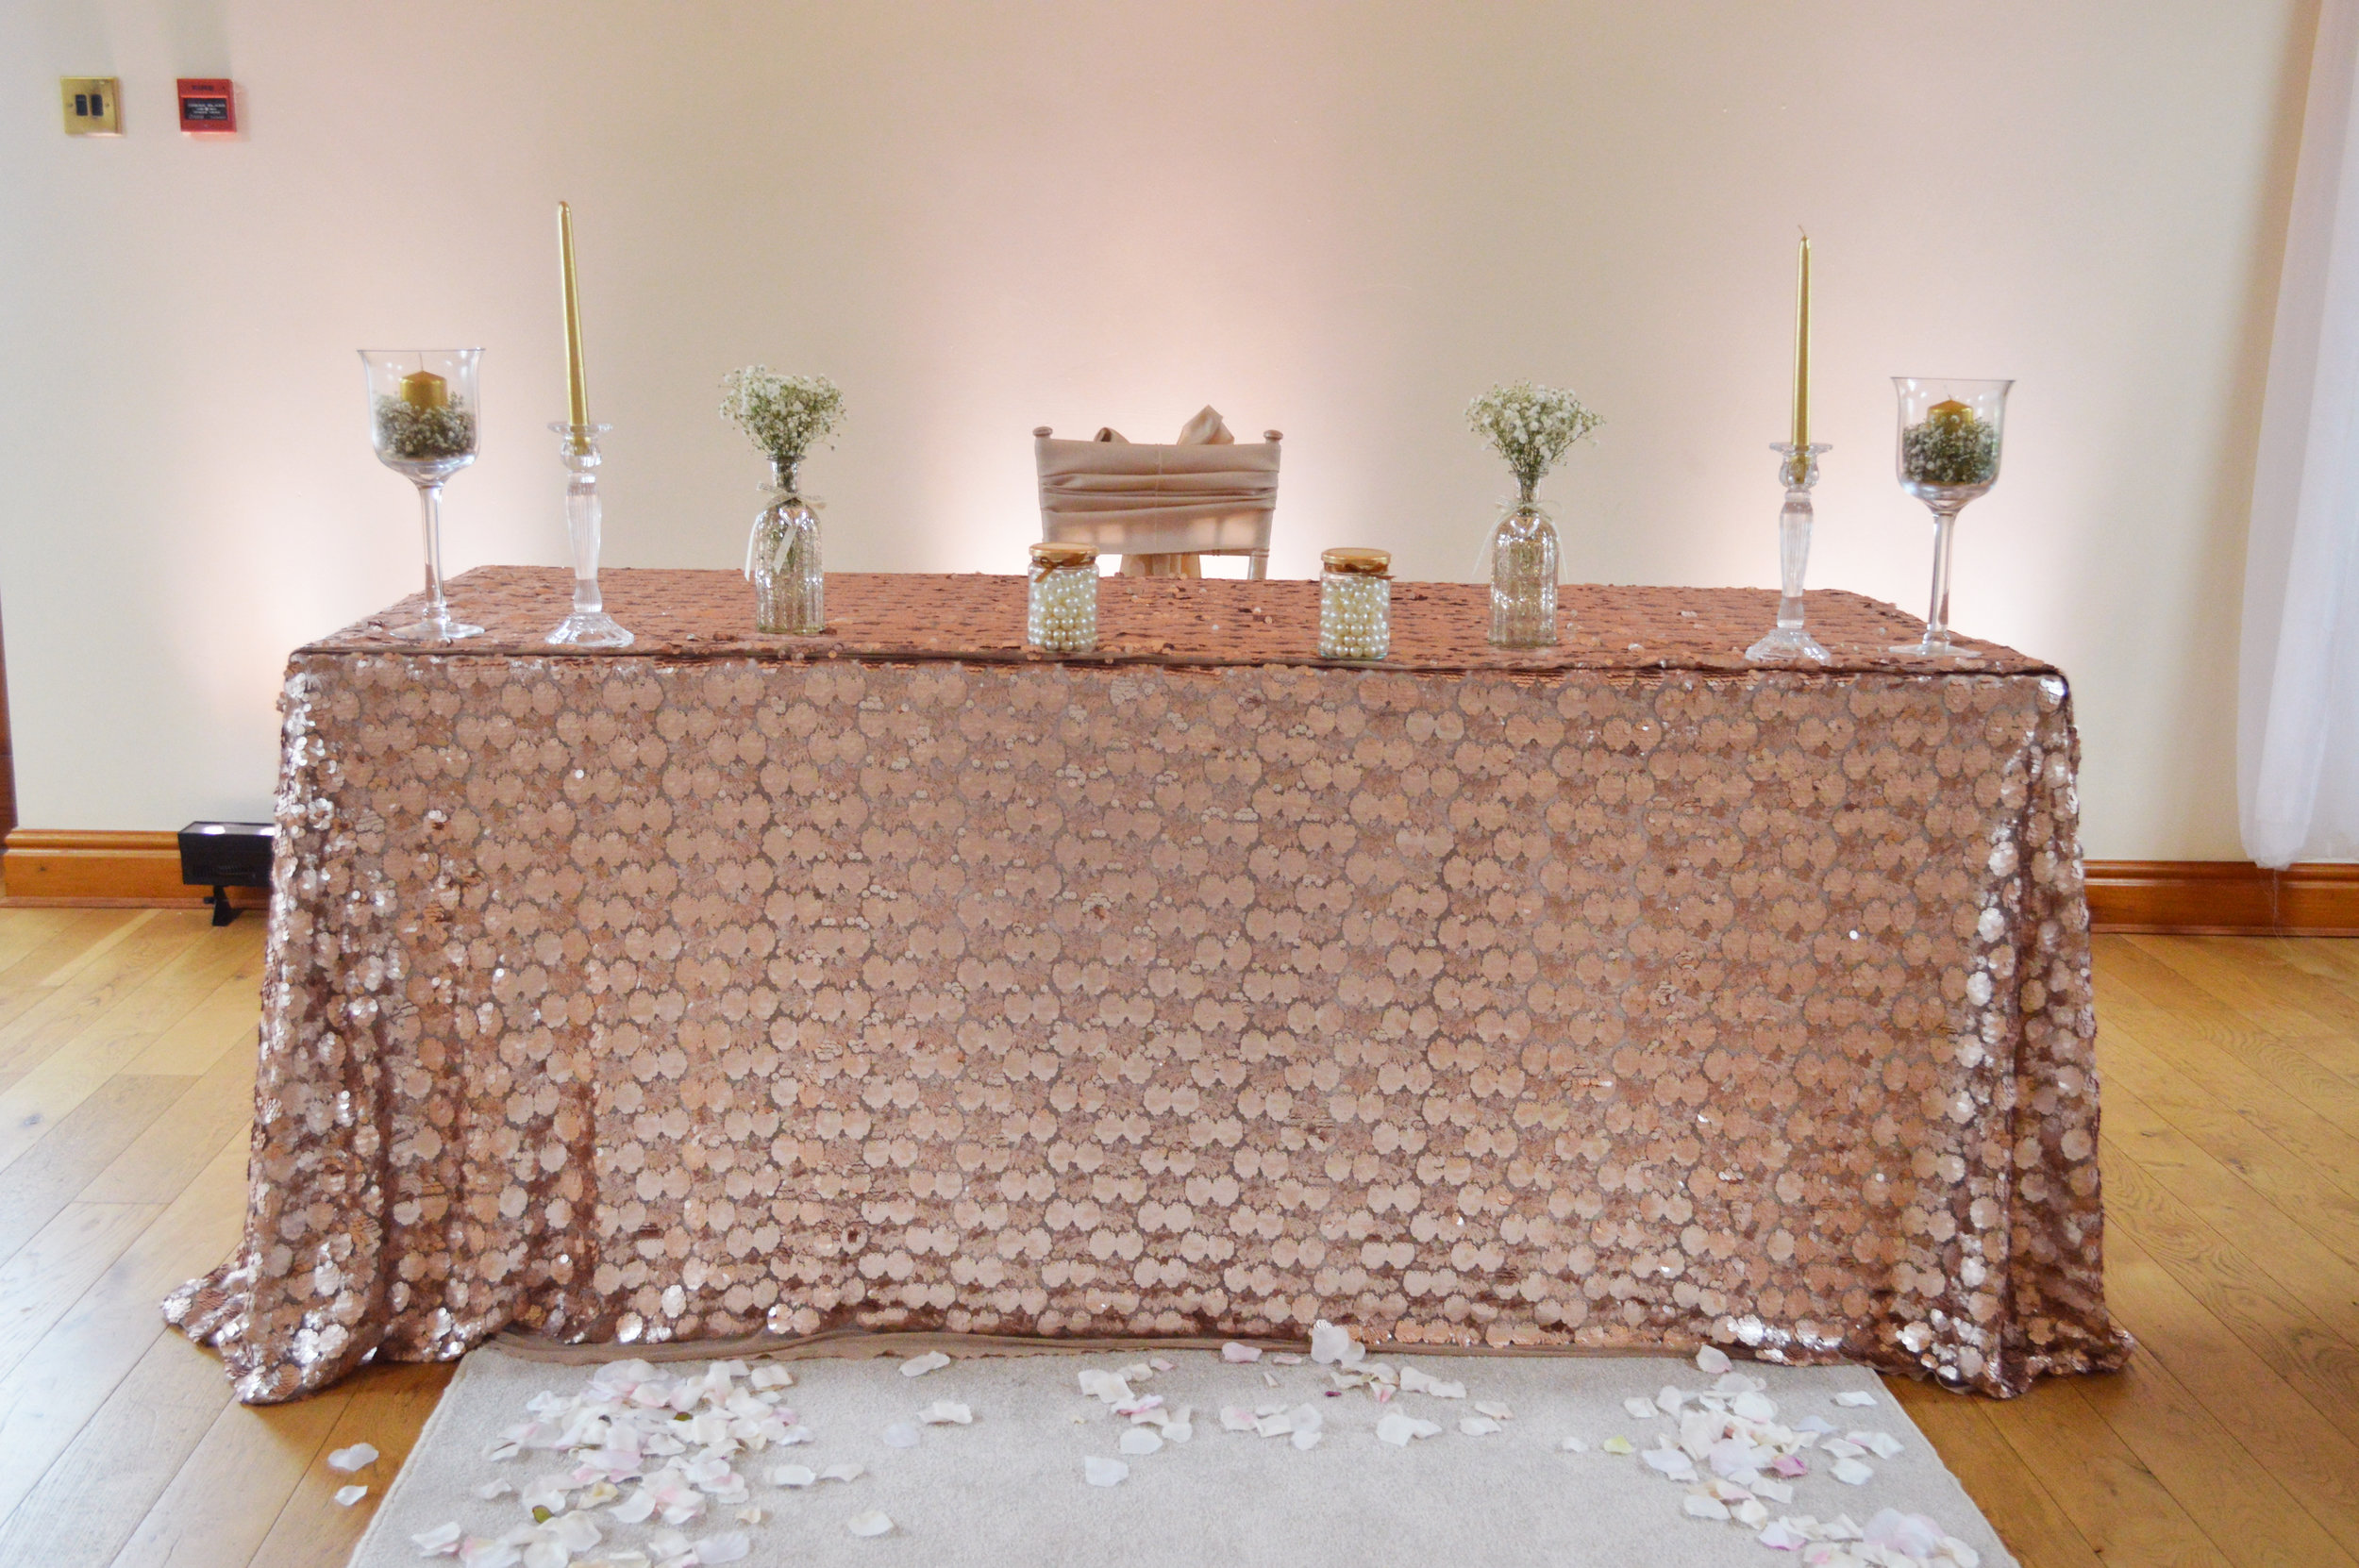 Registar sequin table cloth